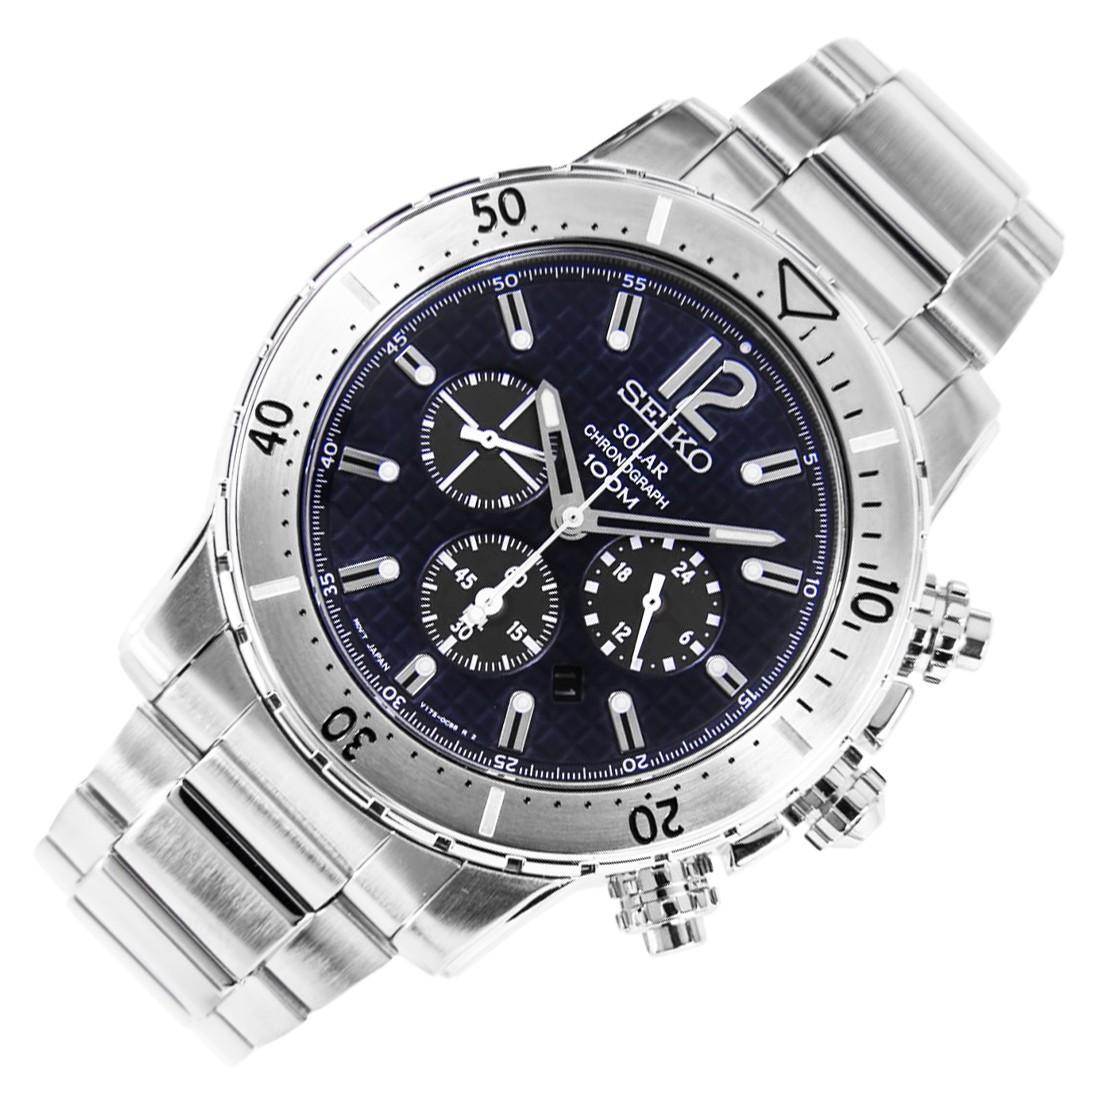 Часы Seiko SSC221P1 хронограф SOLAR